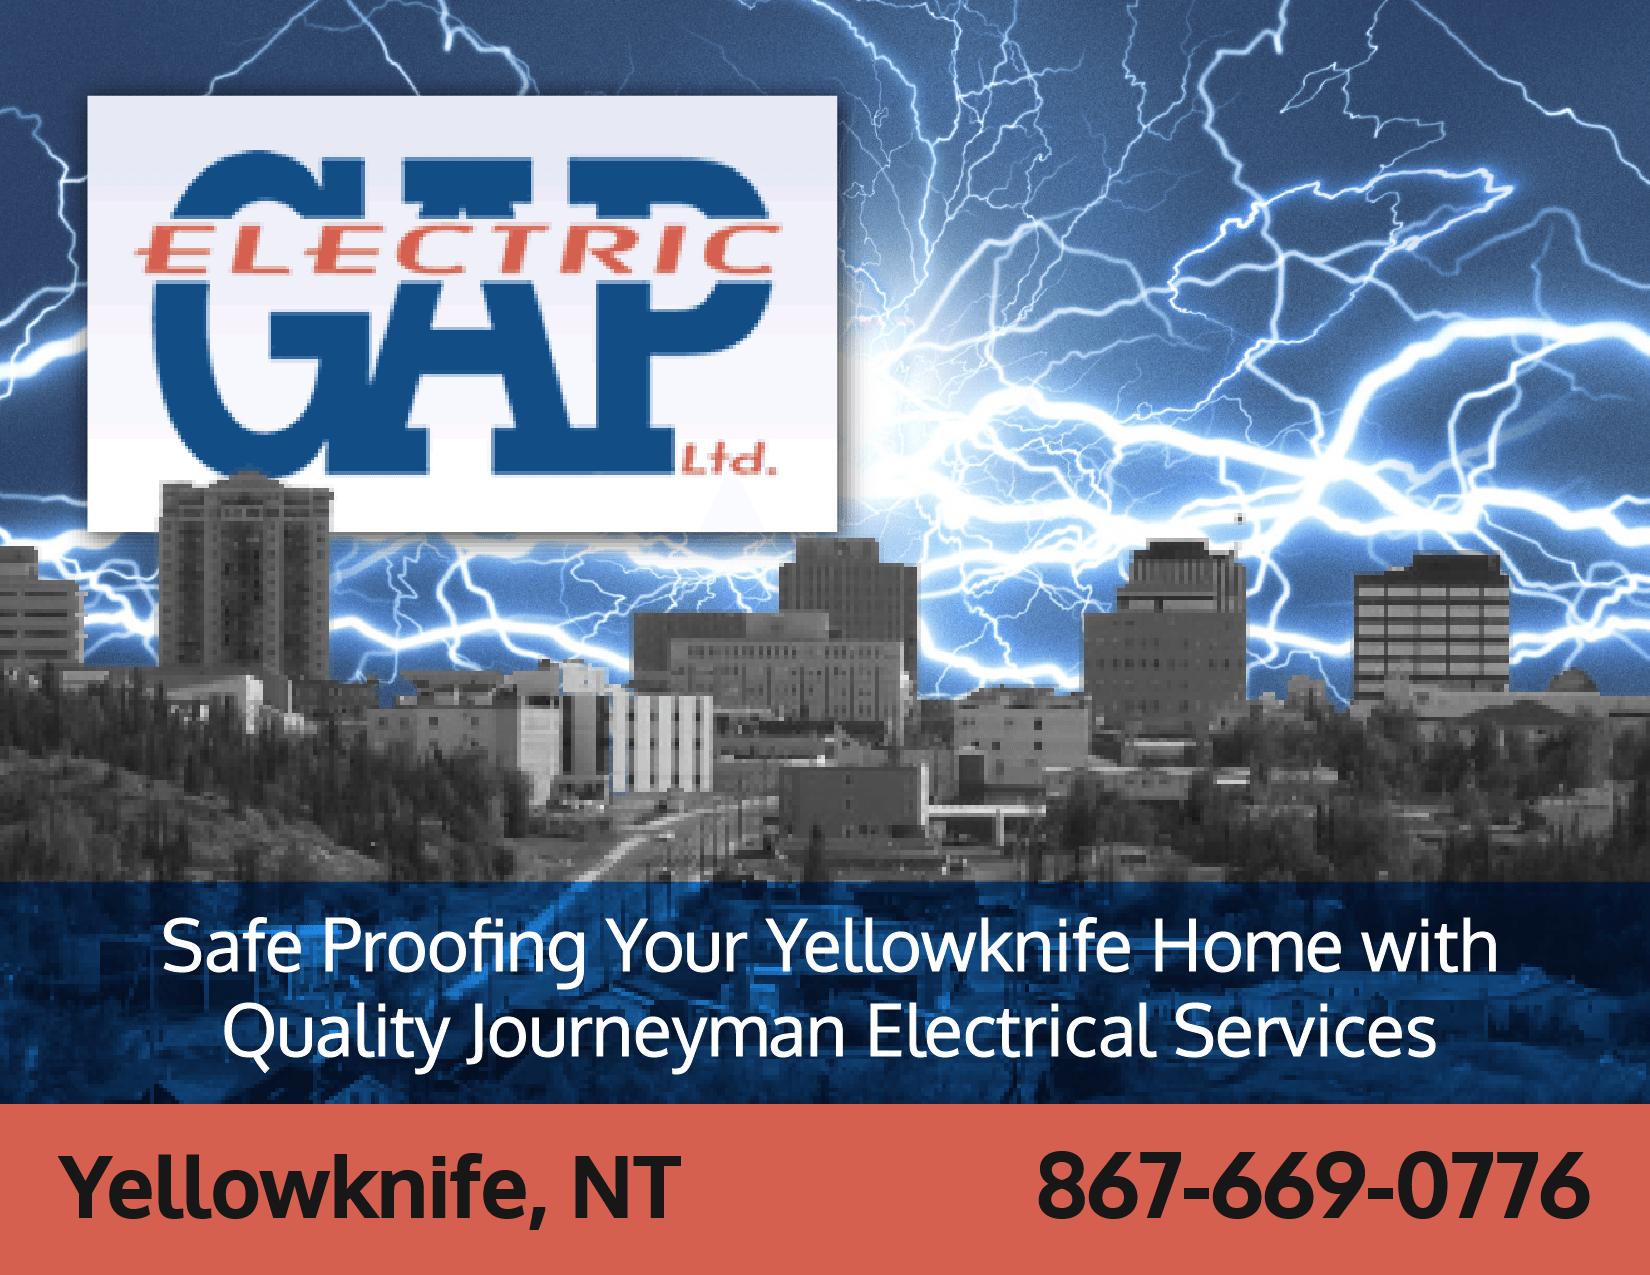 GAP Electric Ltd Yellowknife